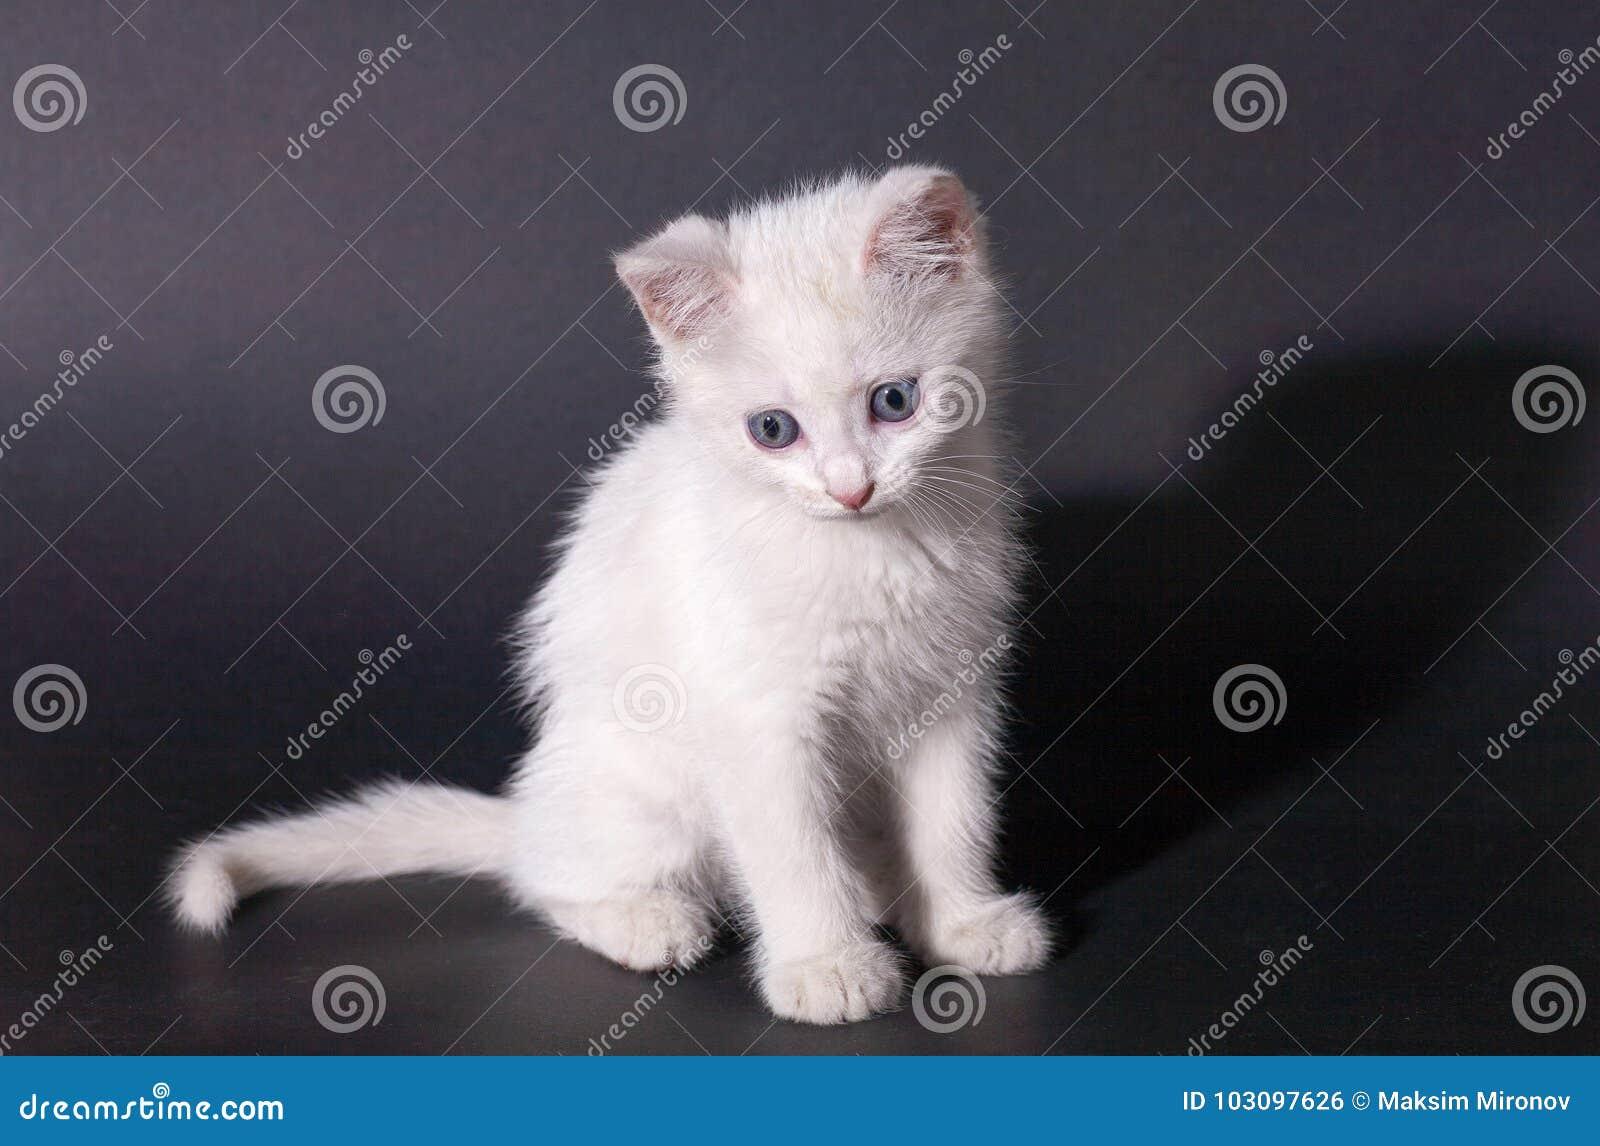 16b1b9cd2c Little Beautiful White Kitten With Blue Eyes Stock Photo - Image of ...